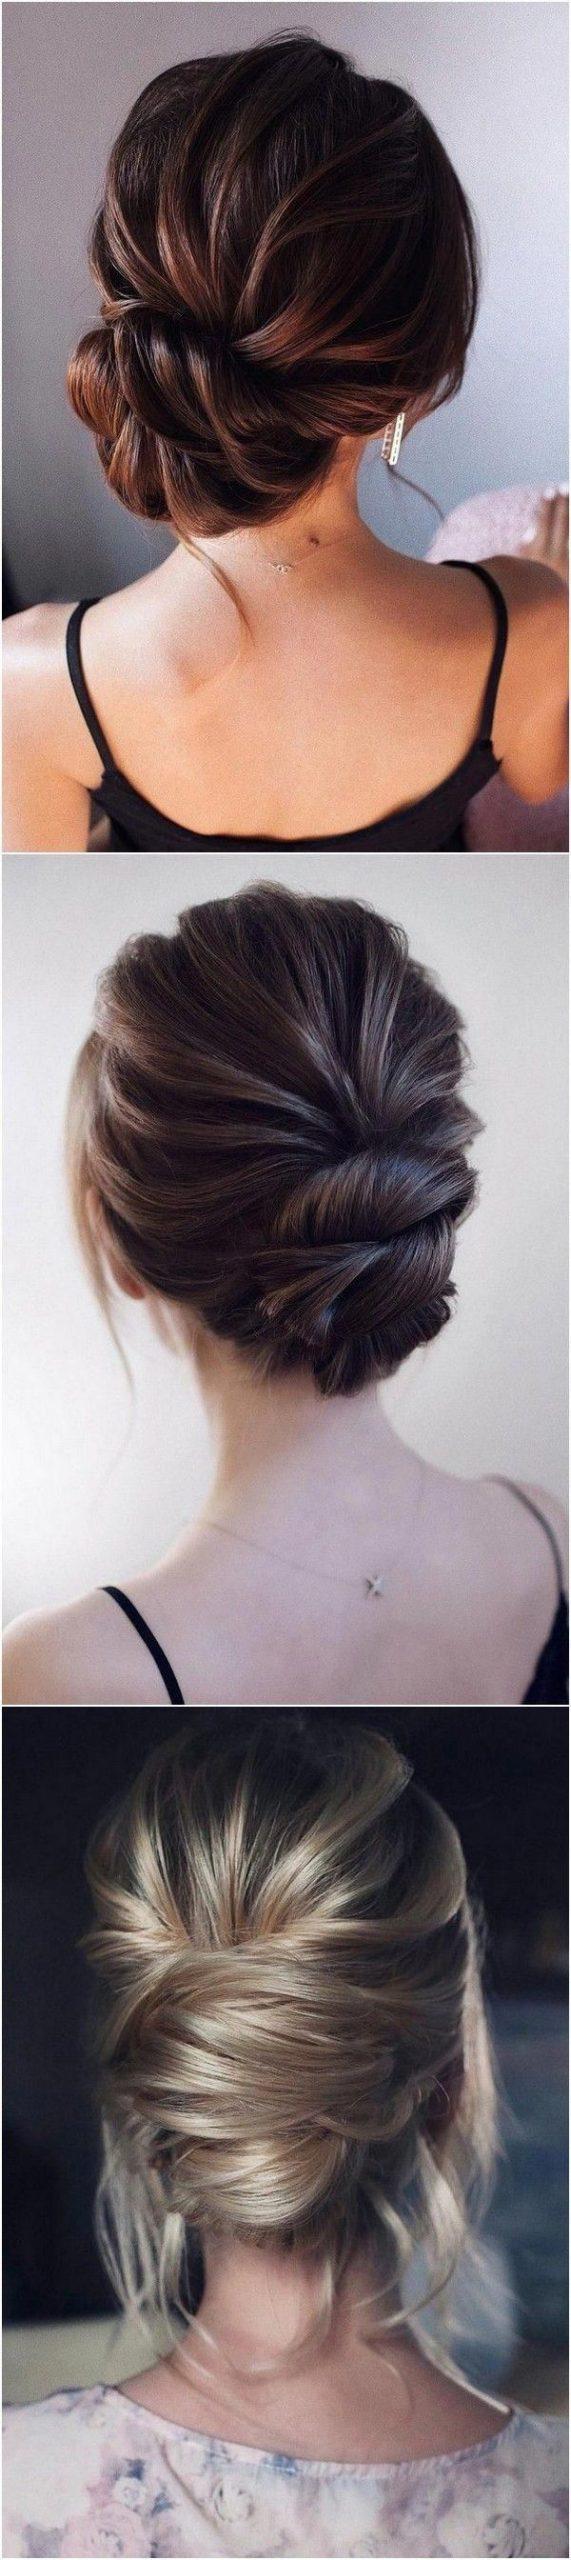 elegantes peinados de boda updo de bollo bajo 3 #weddinghairstyles ,  #peinadosd…